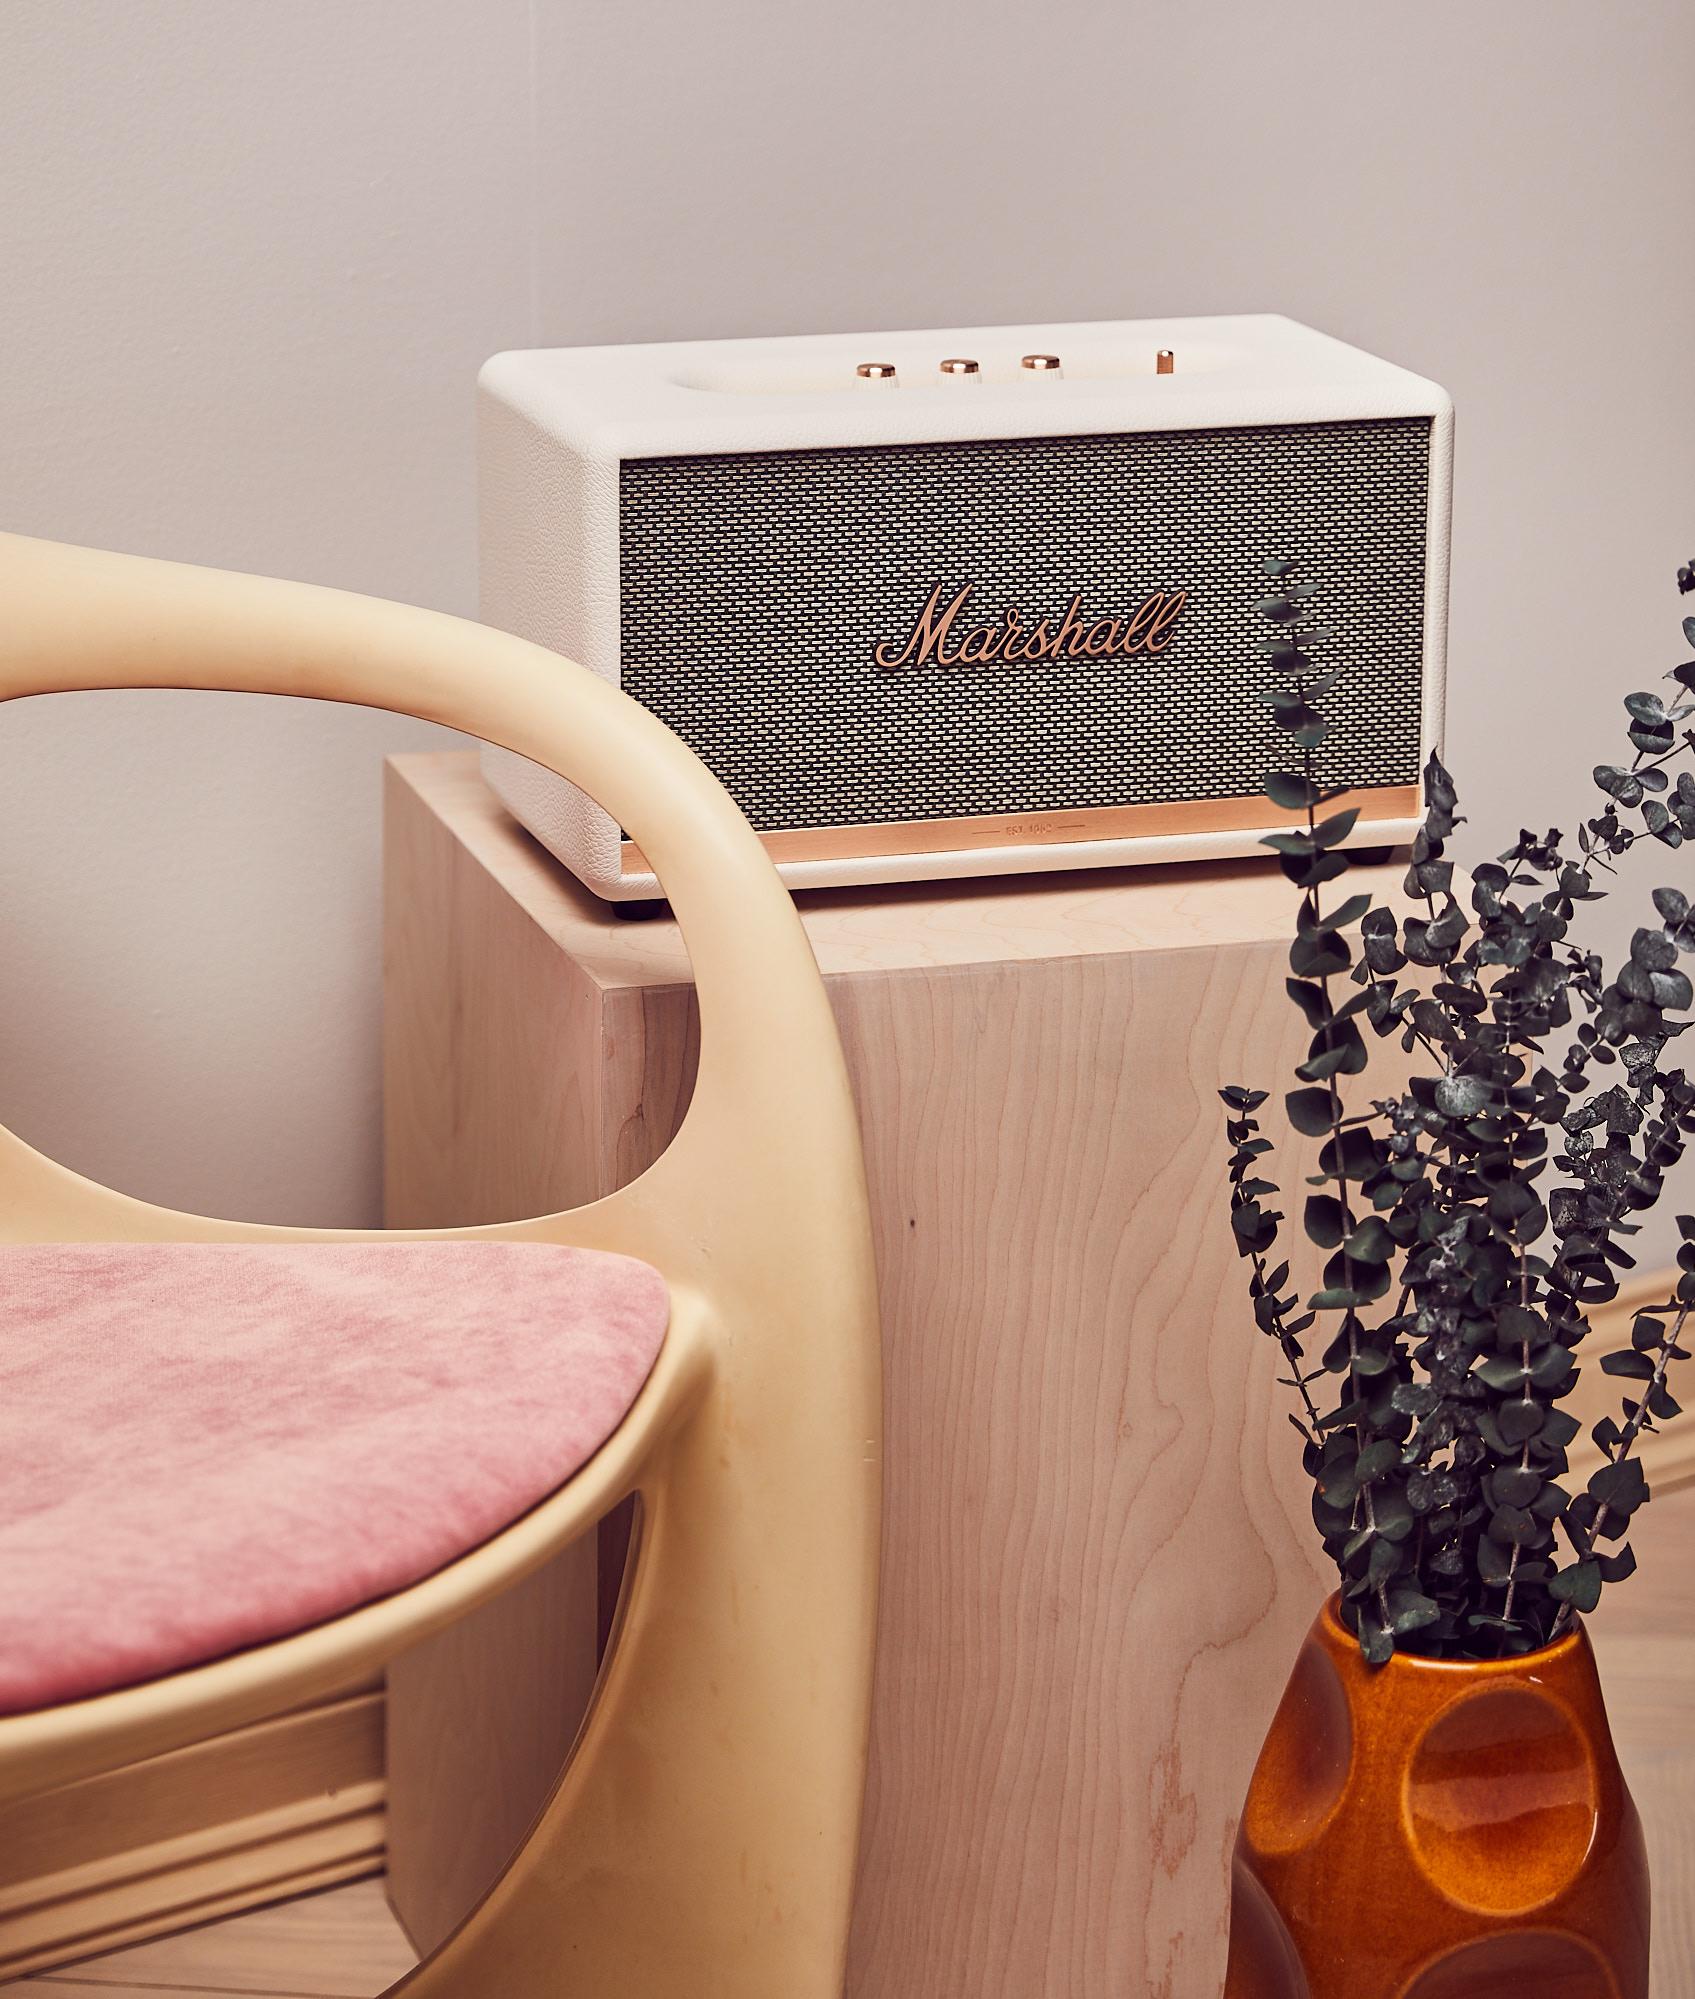 Marshall speaker zooomed out.jpg